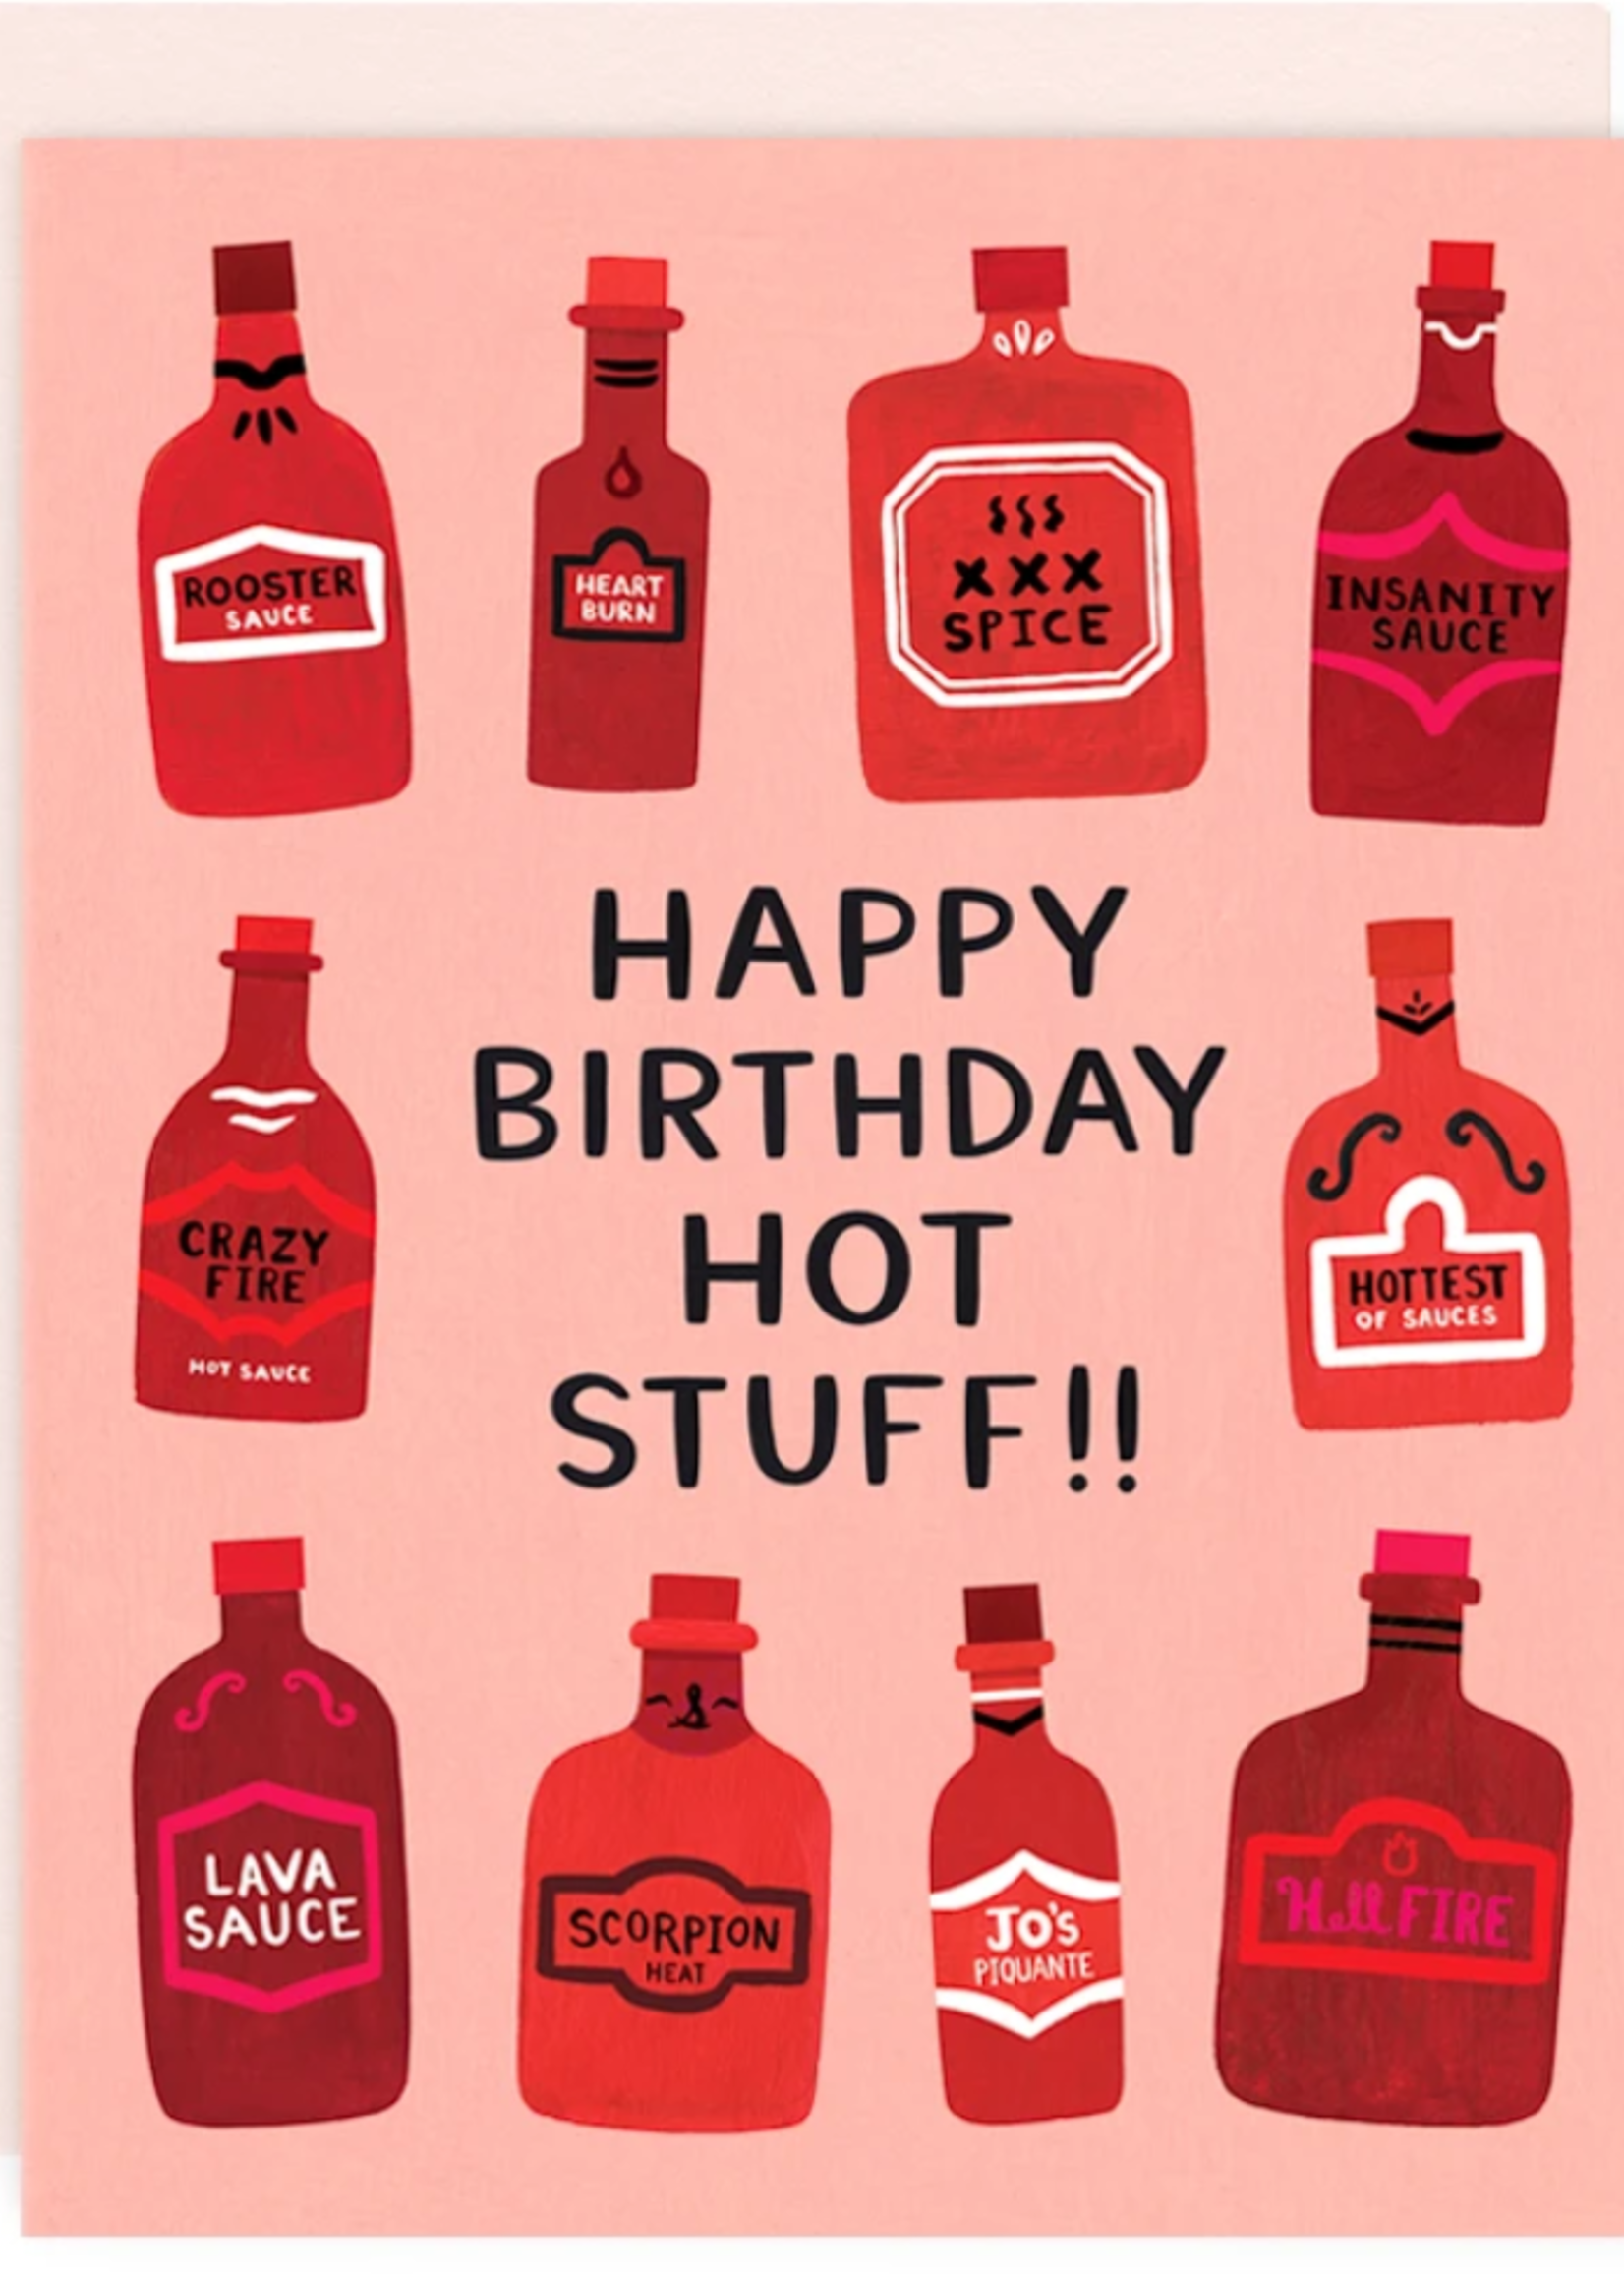 girl w/ knife hot stuff birthday card